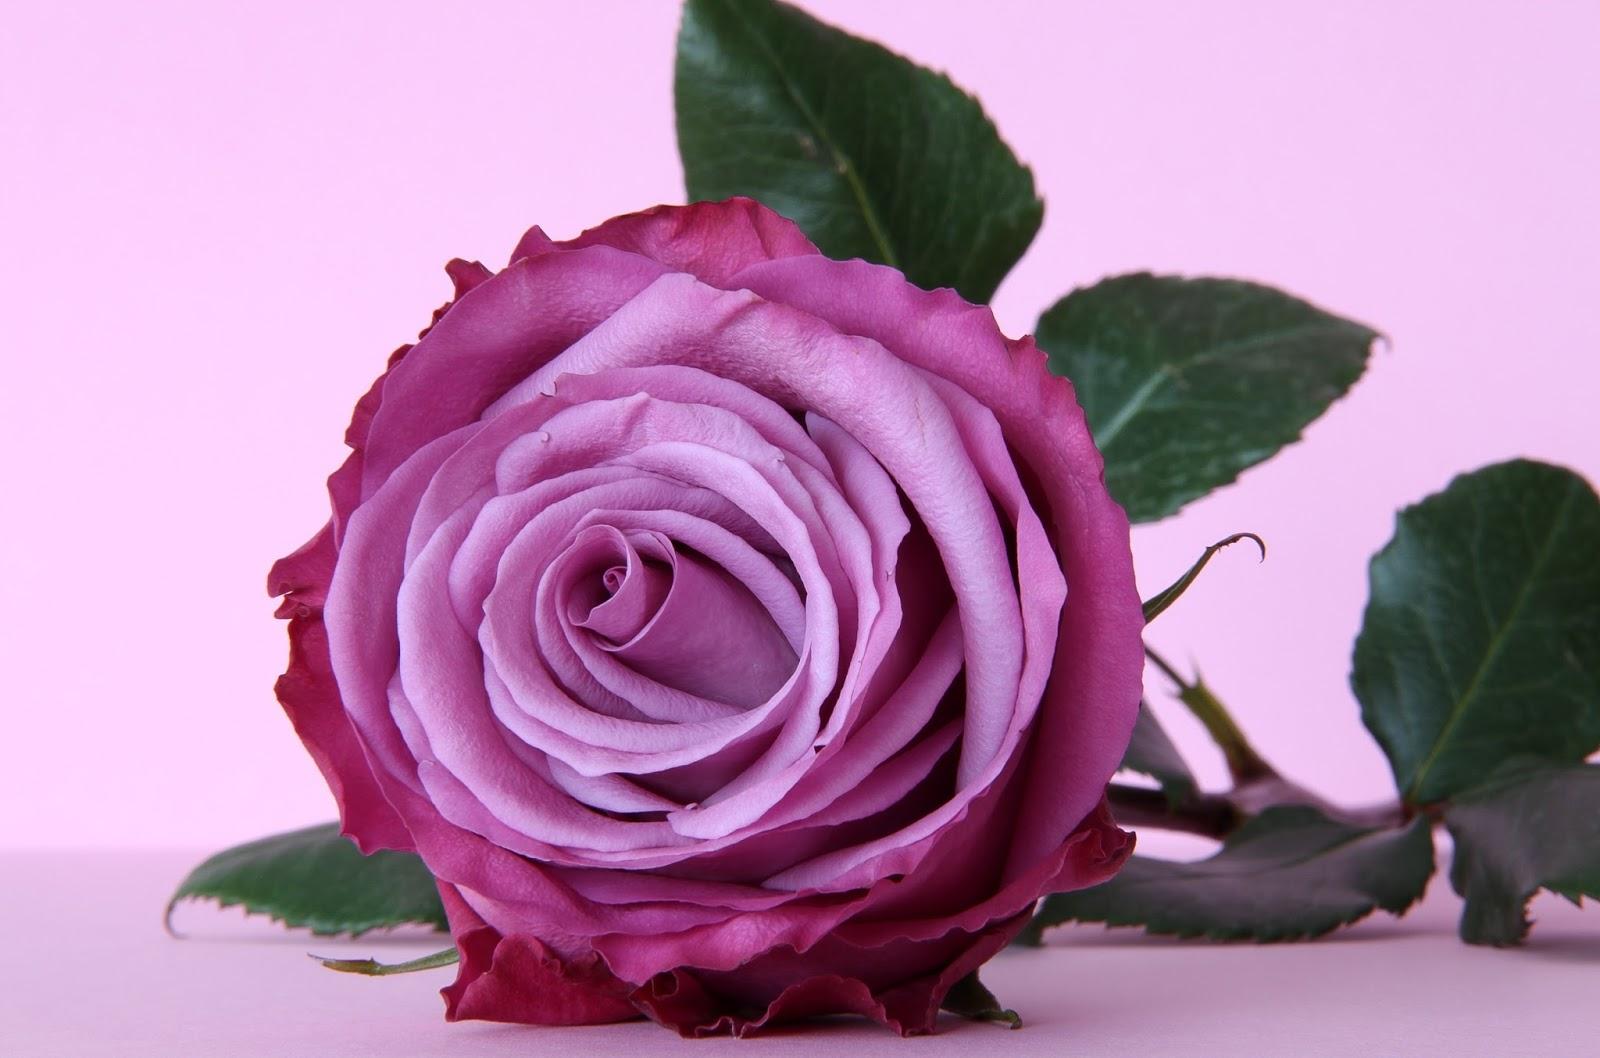 Beautiful Roses Hd Desktop Wallpapers In 1080p Super Hd Wallpaperss